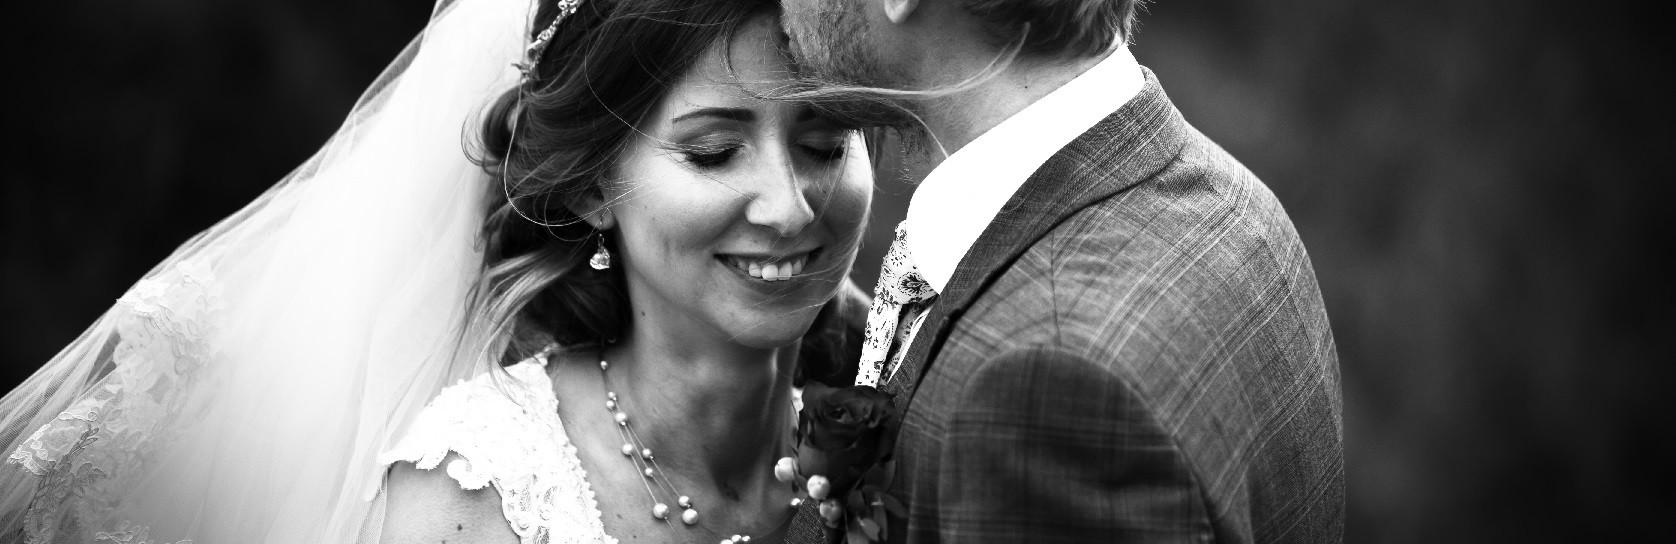 Abby and Dan's Wedding | The Cliff Hotel & Spa – Hotel, Restaurant, Bar, Spa